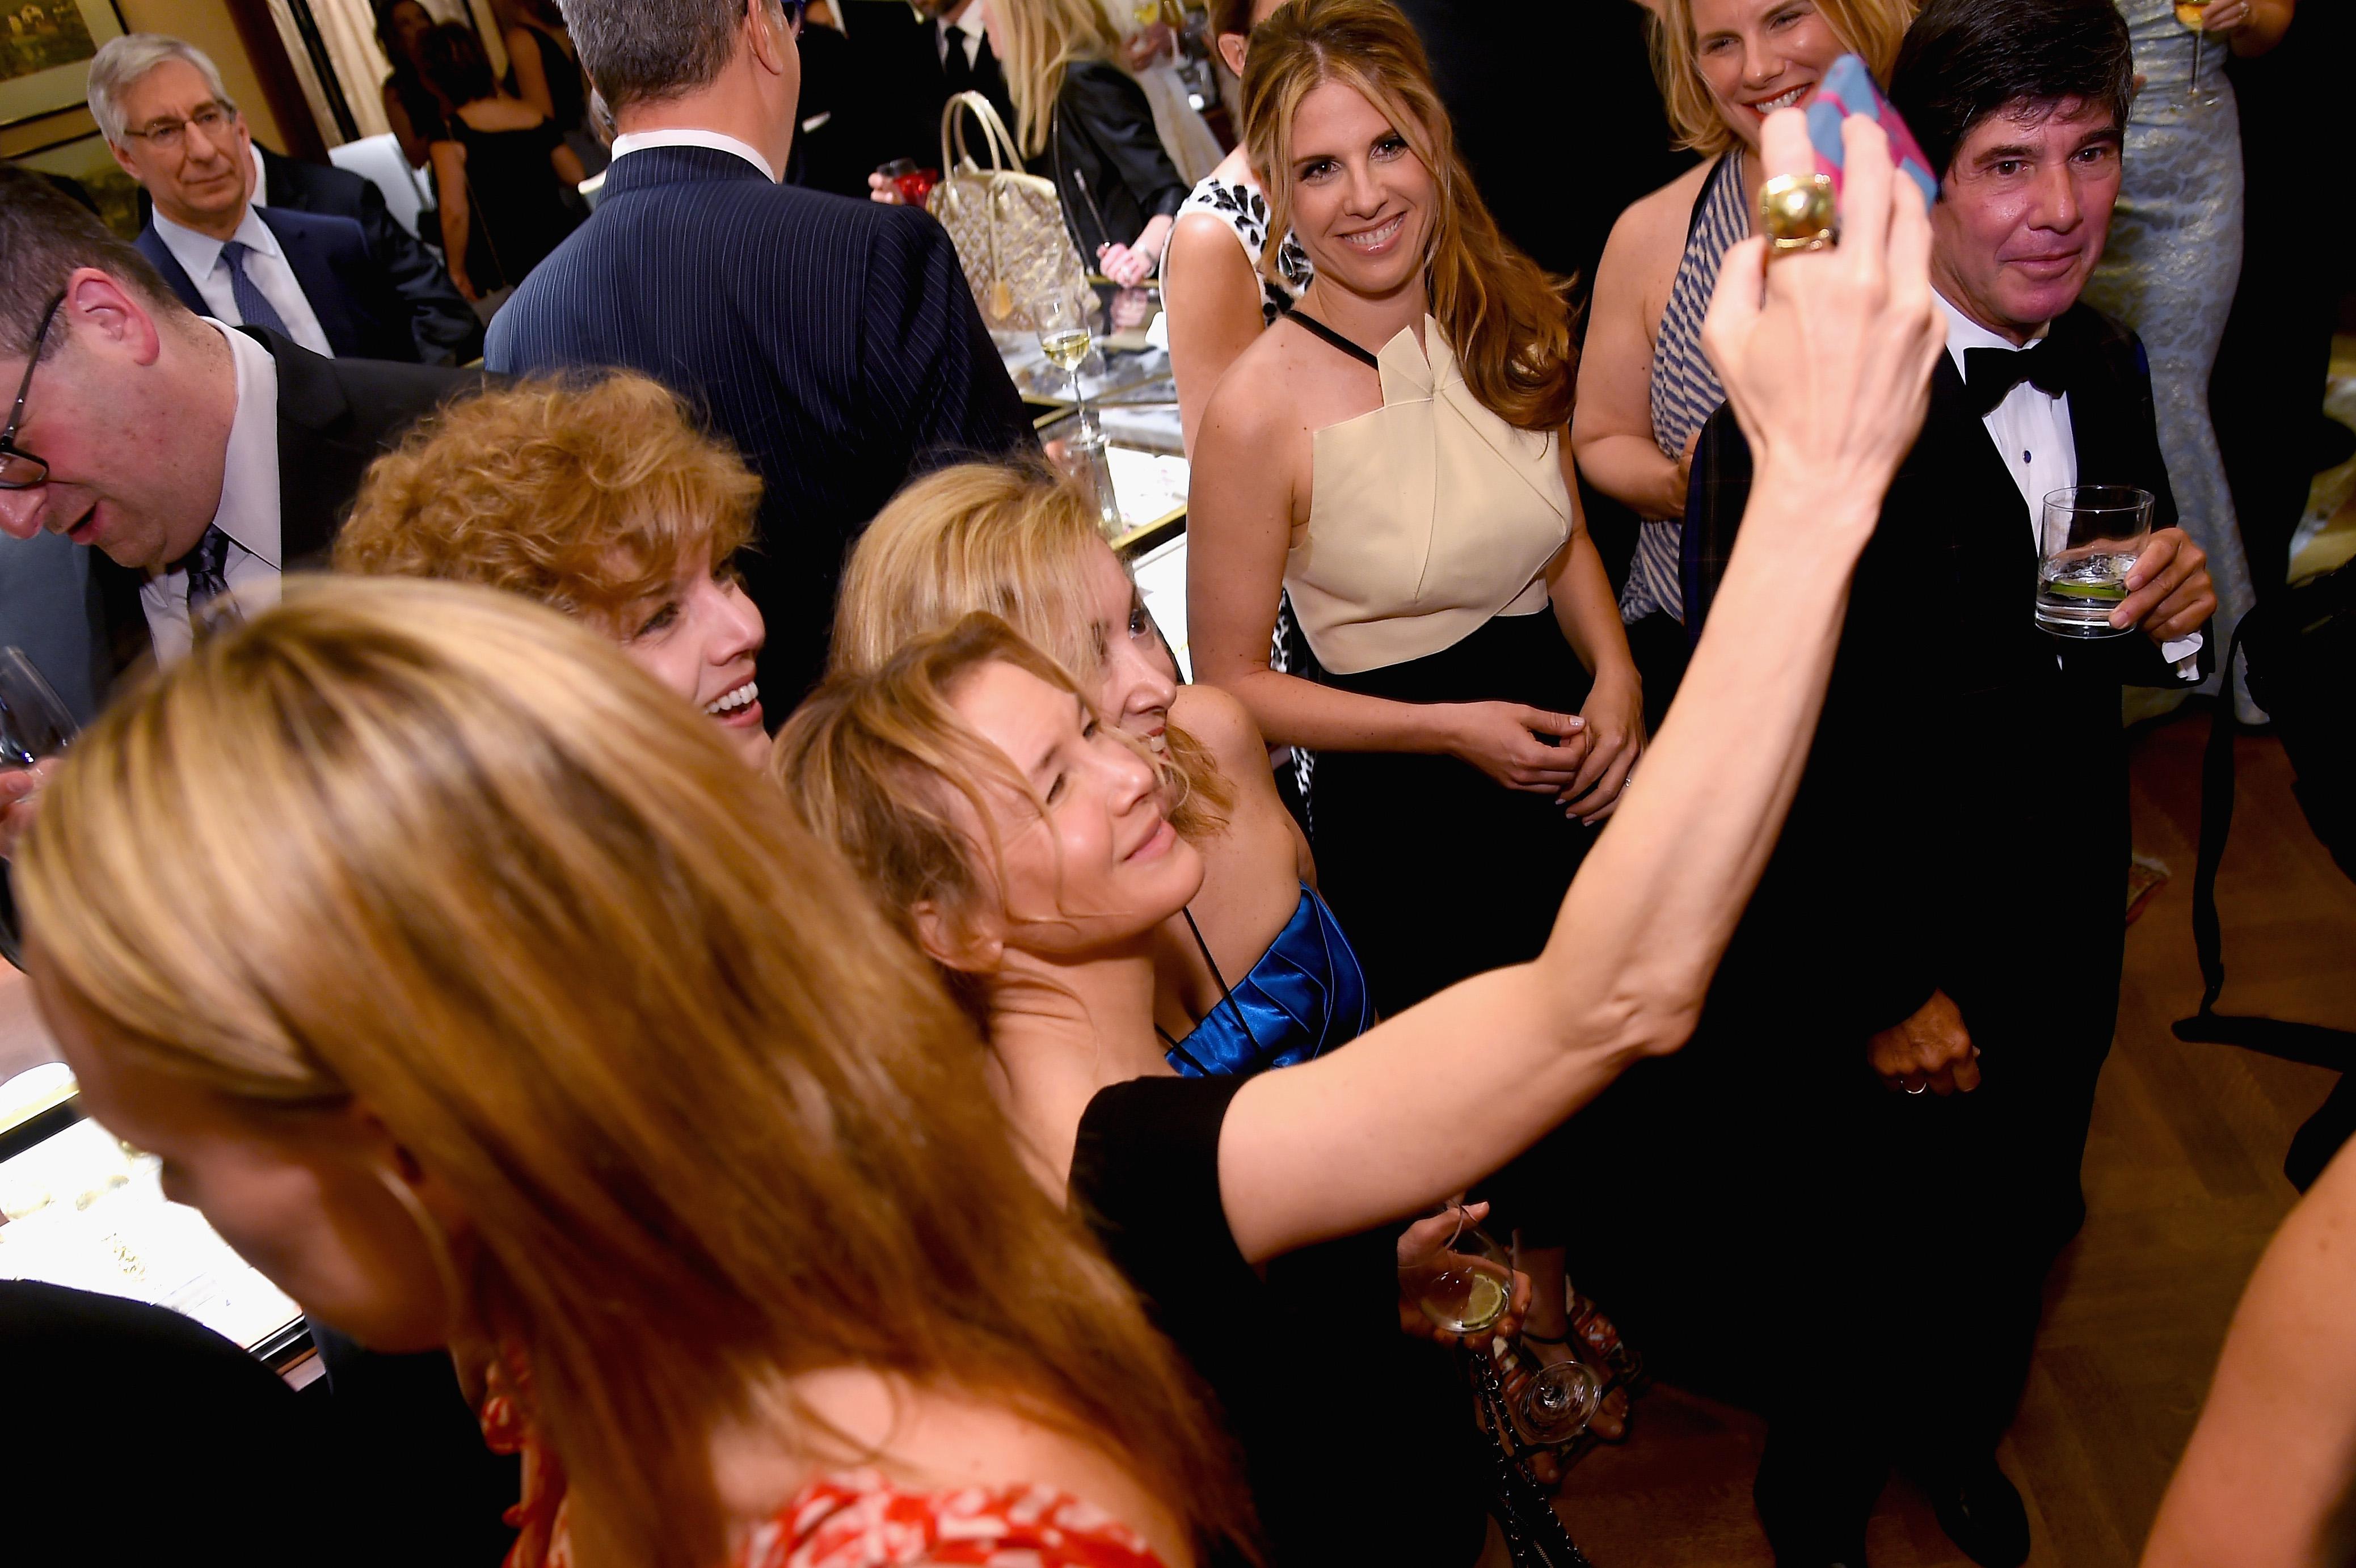 GREENWICH, CT - JUNE 01:  Renee Zellweger attends the Betteridge Cartier Cocktail Reception during the Greenwich International Film Festival, Day 1 on June 1, 2017 in Greenwich, Connecticut.  (Photo by Ben Gabbe/Getty Images for Greenwich International Film Festival)